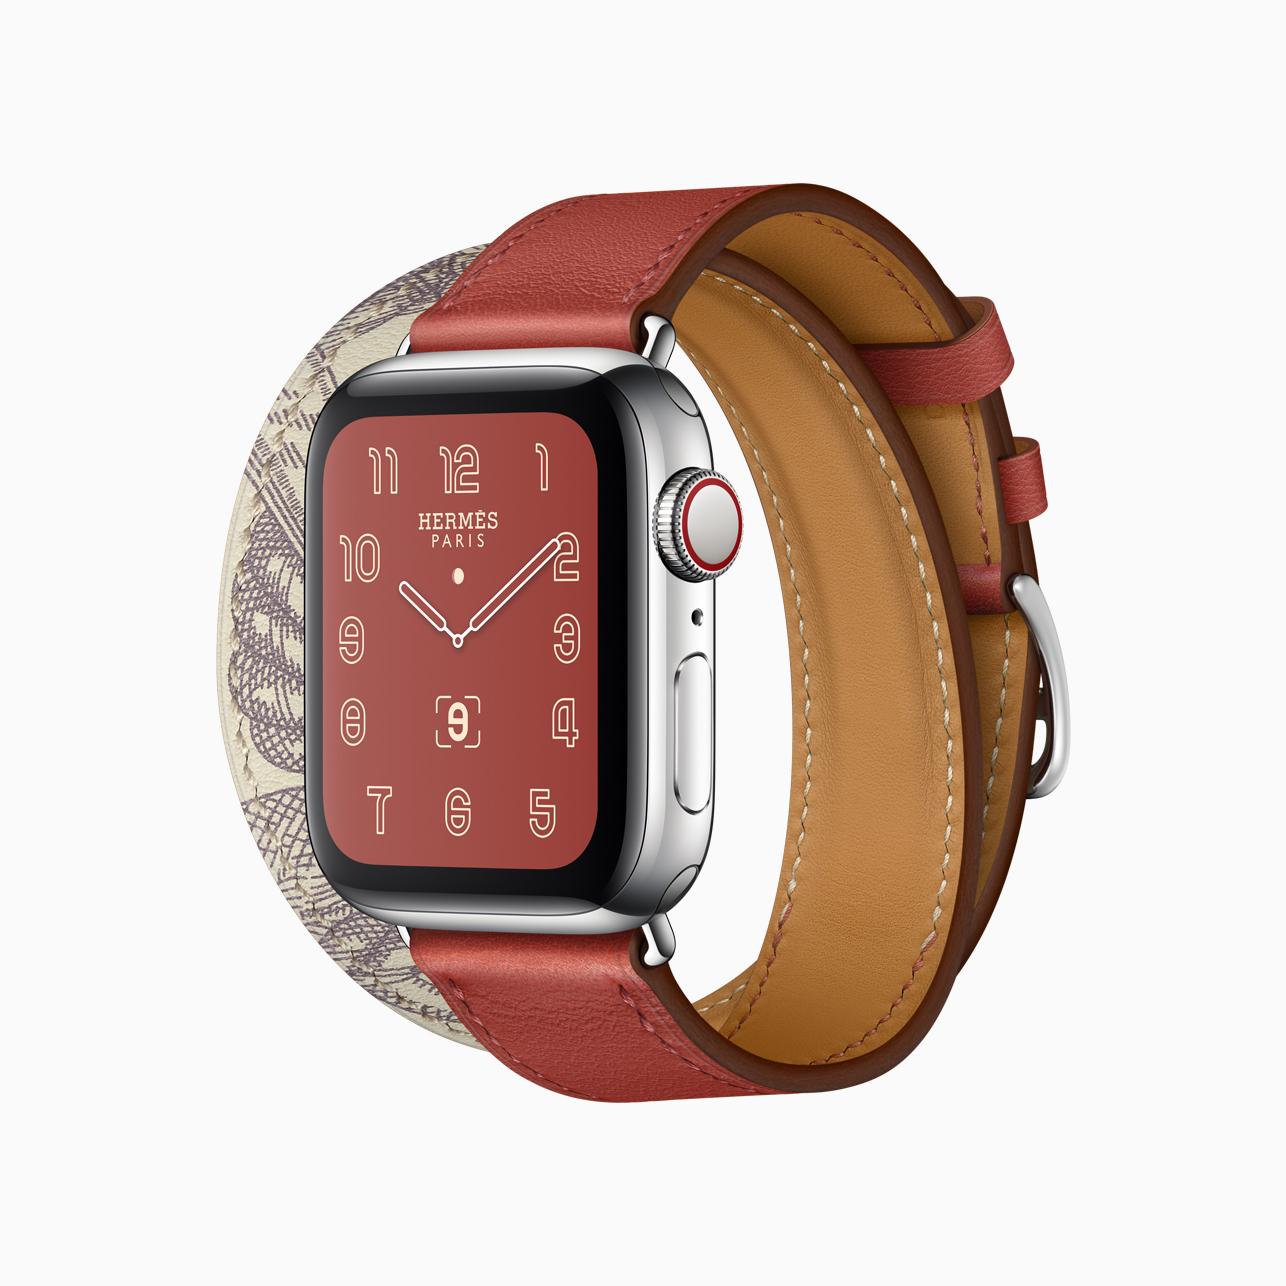 apple_watch_series_5-hermes-face-double-tour-della-cavalleria-print-brique-beton-grey-band-091019.jpg